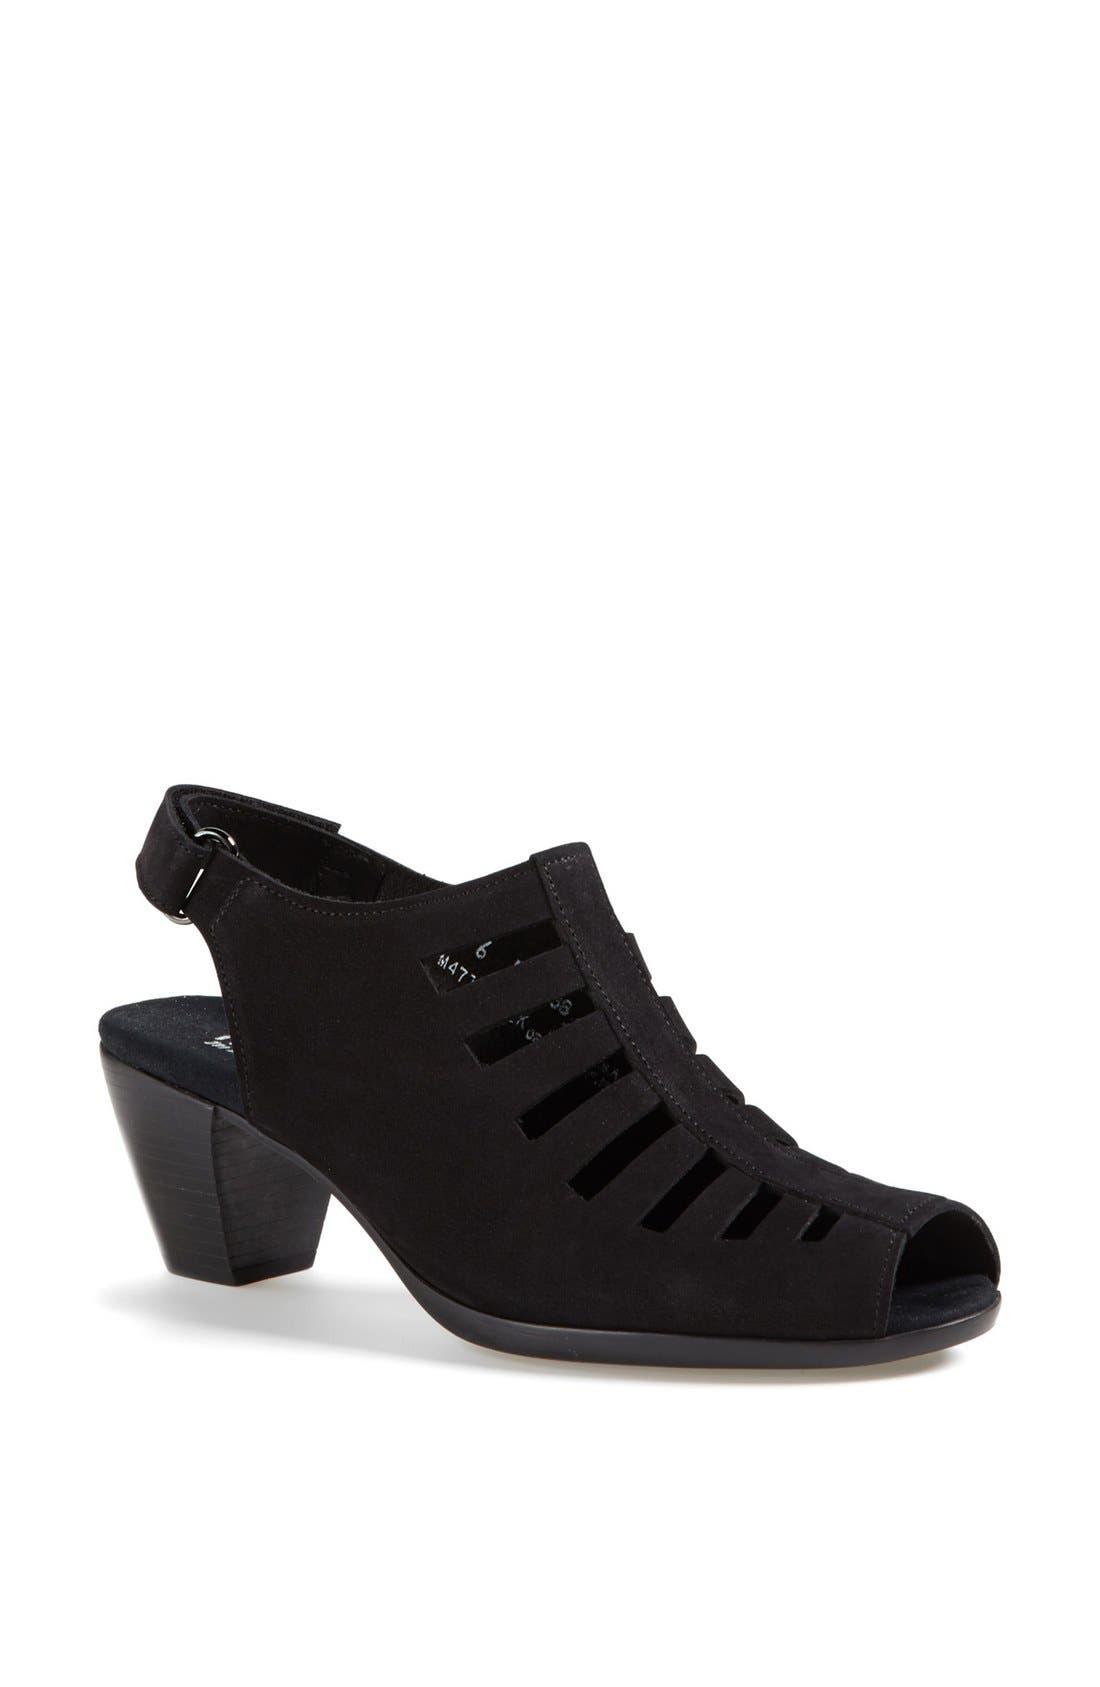 MUNRO 'Abby' Slingback Sandal, Main, color, BLACK NUBUCK LEATHER